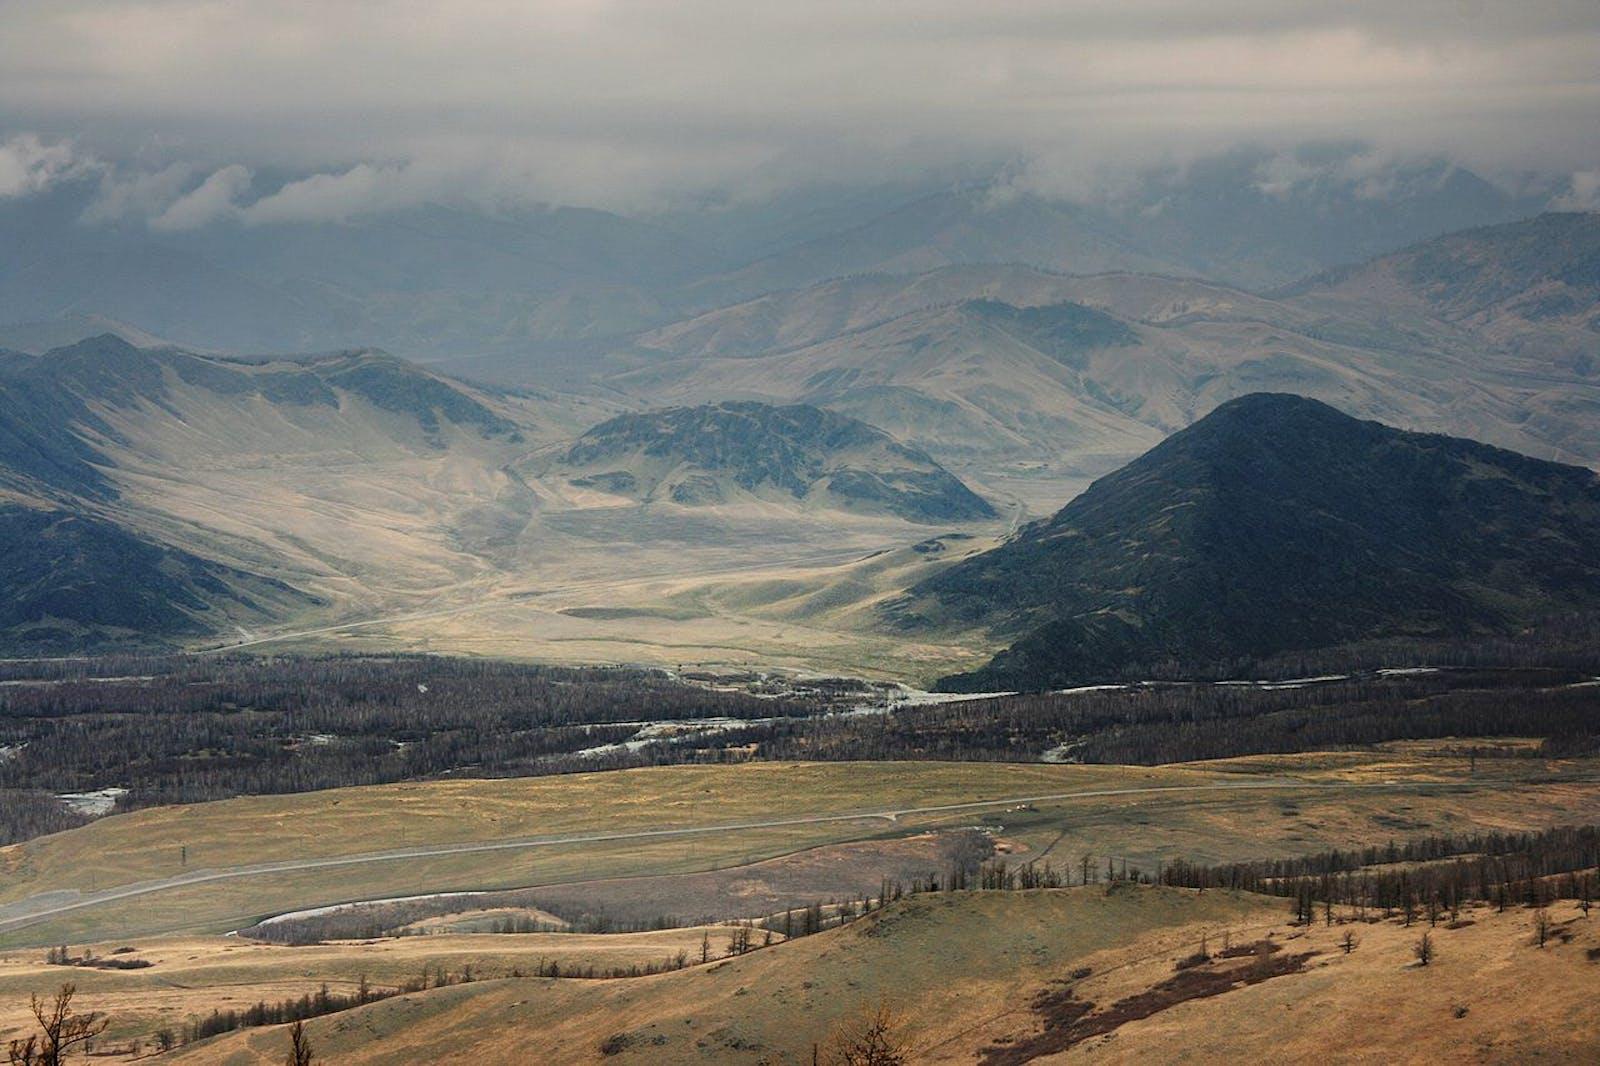 Altai Steppe and Semi-Desert